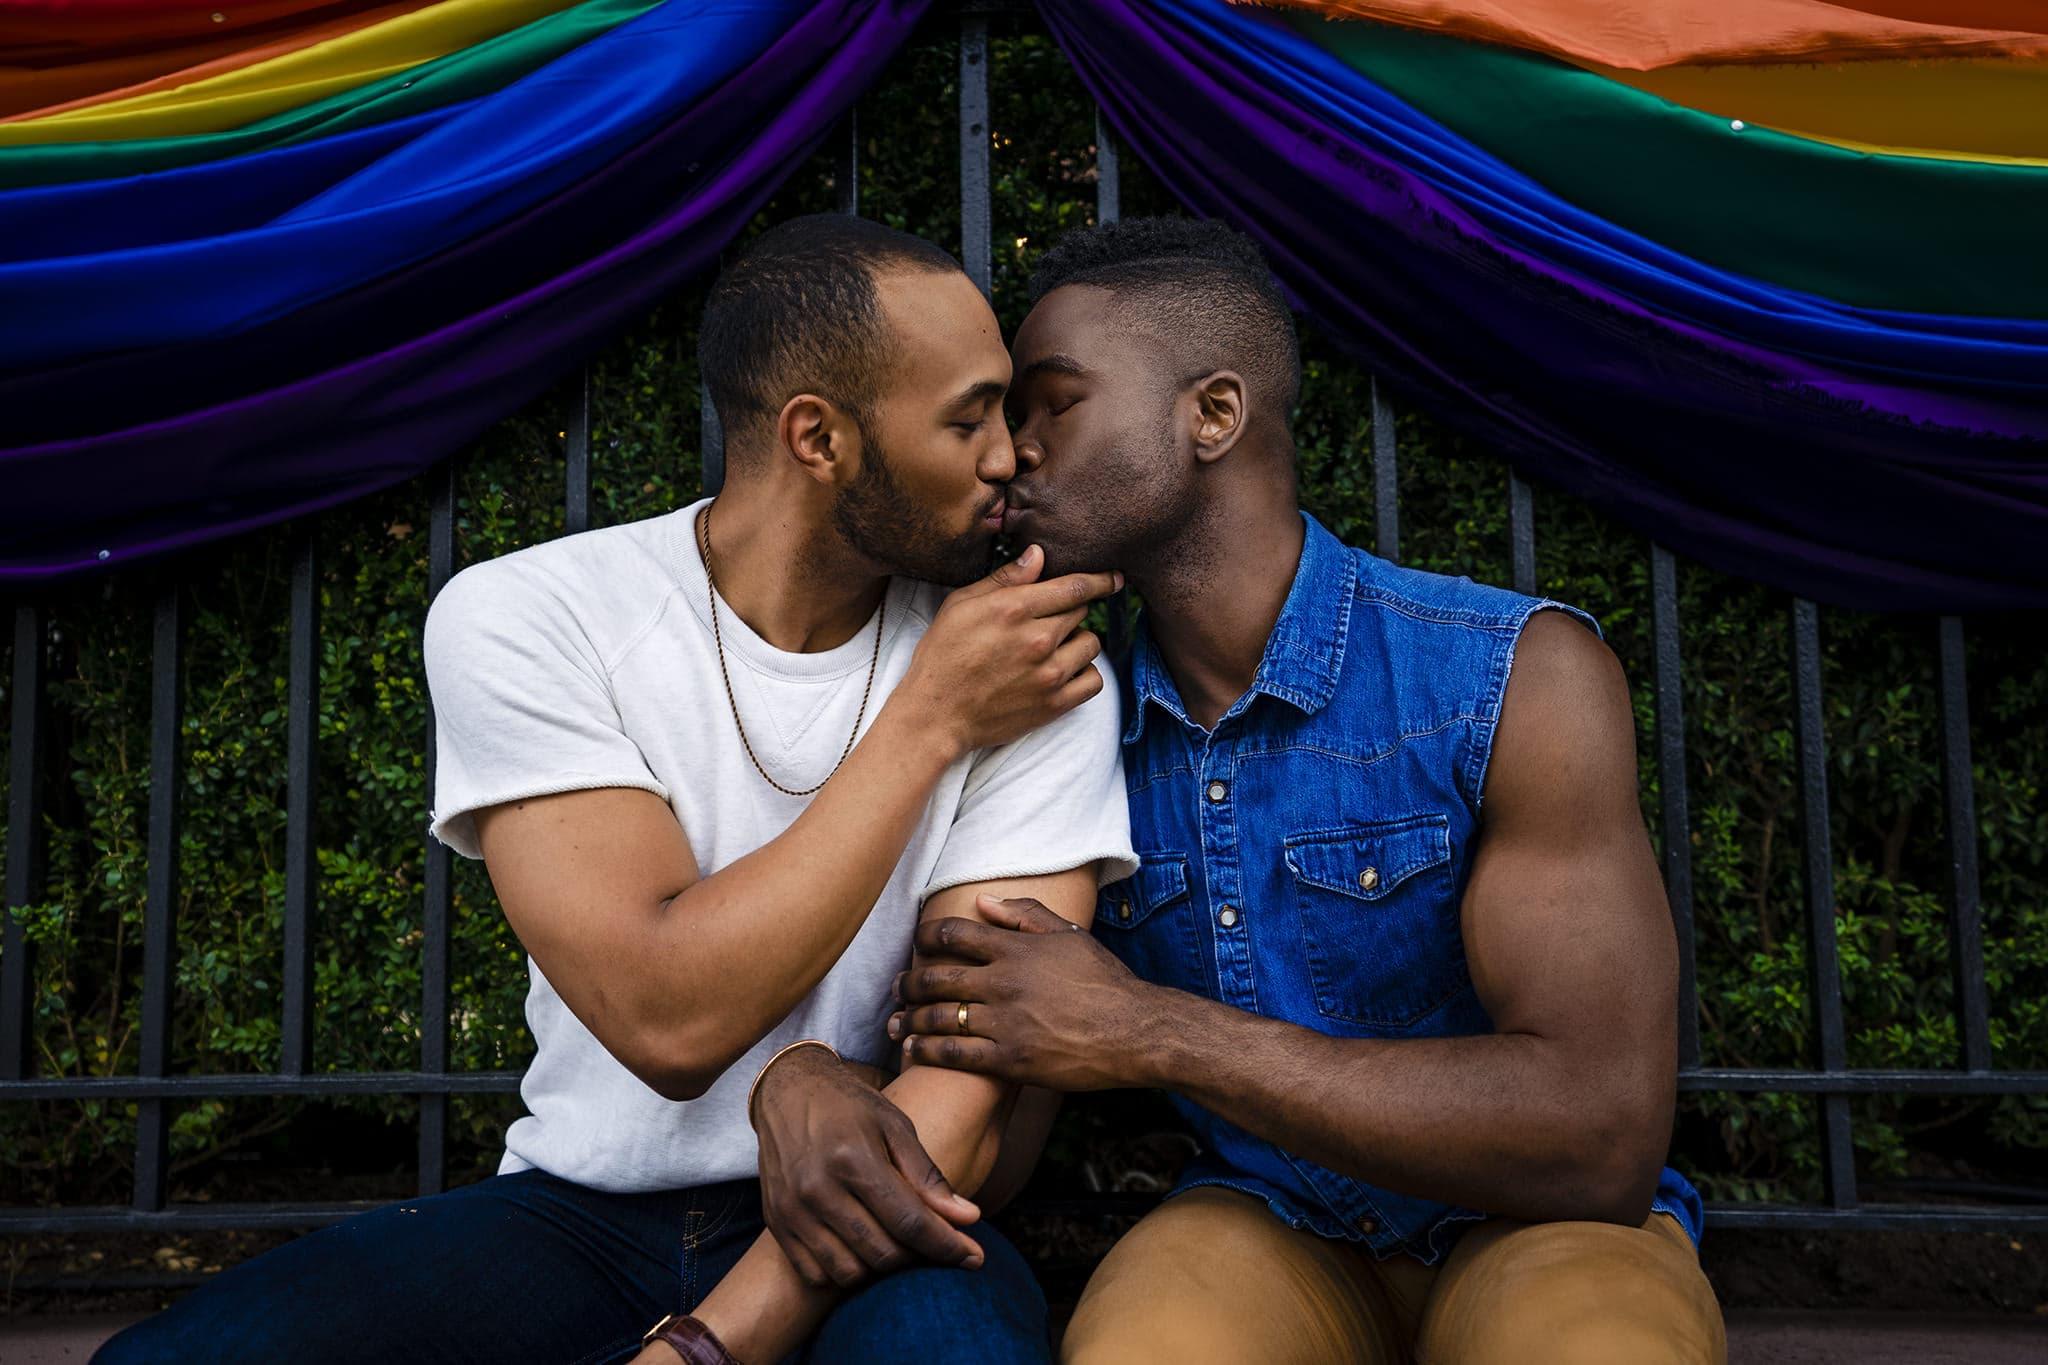 Studio 22 Photography - LGBTQ Engagement Photos